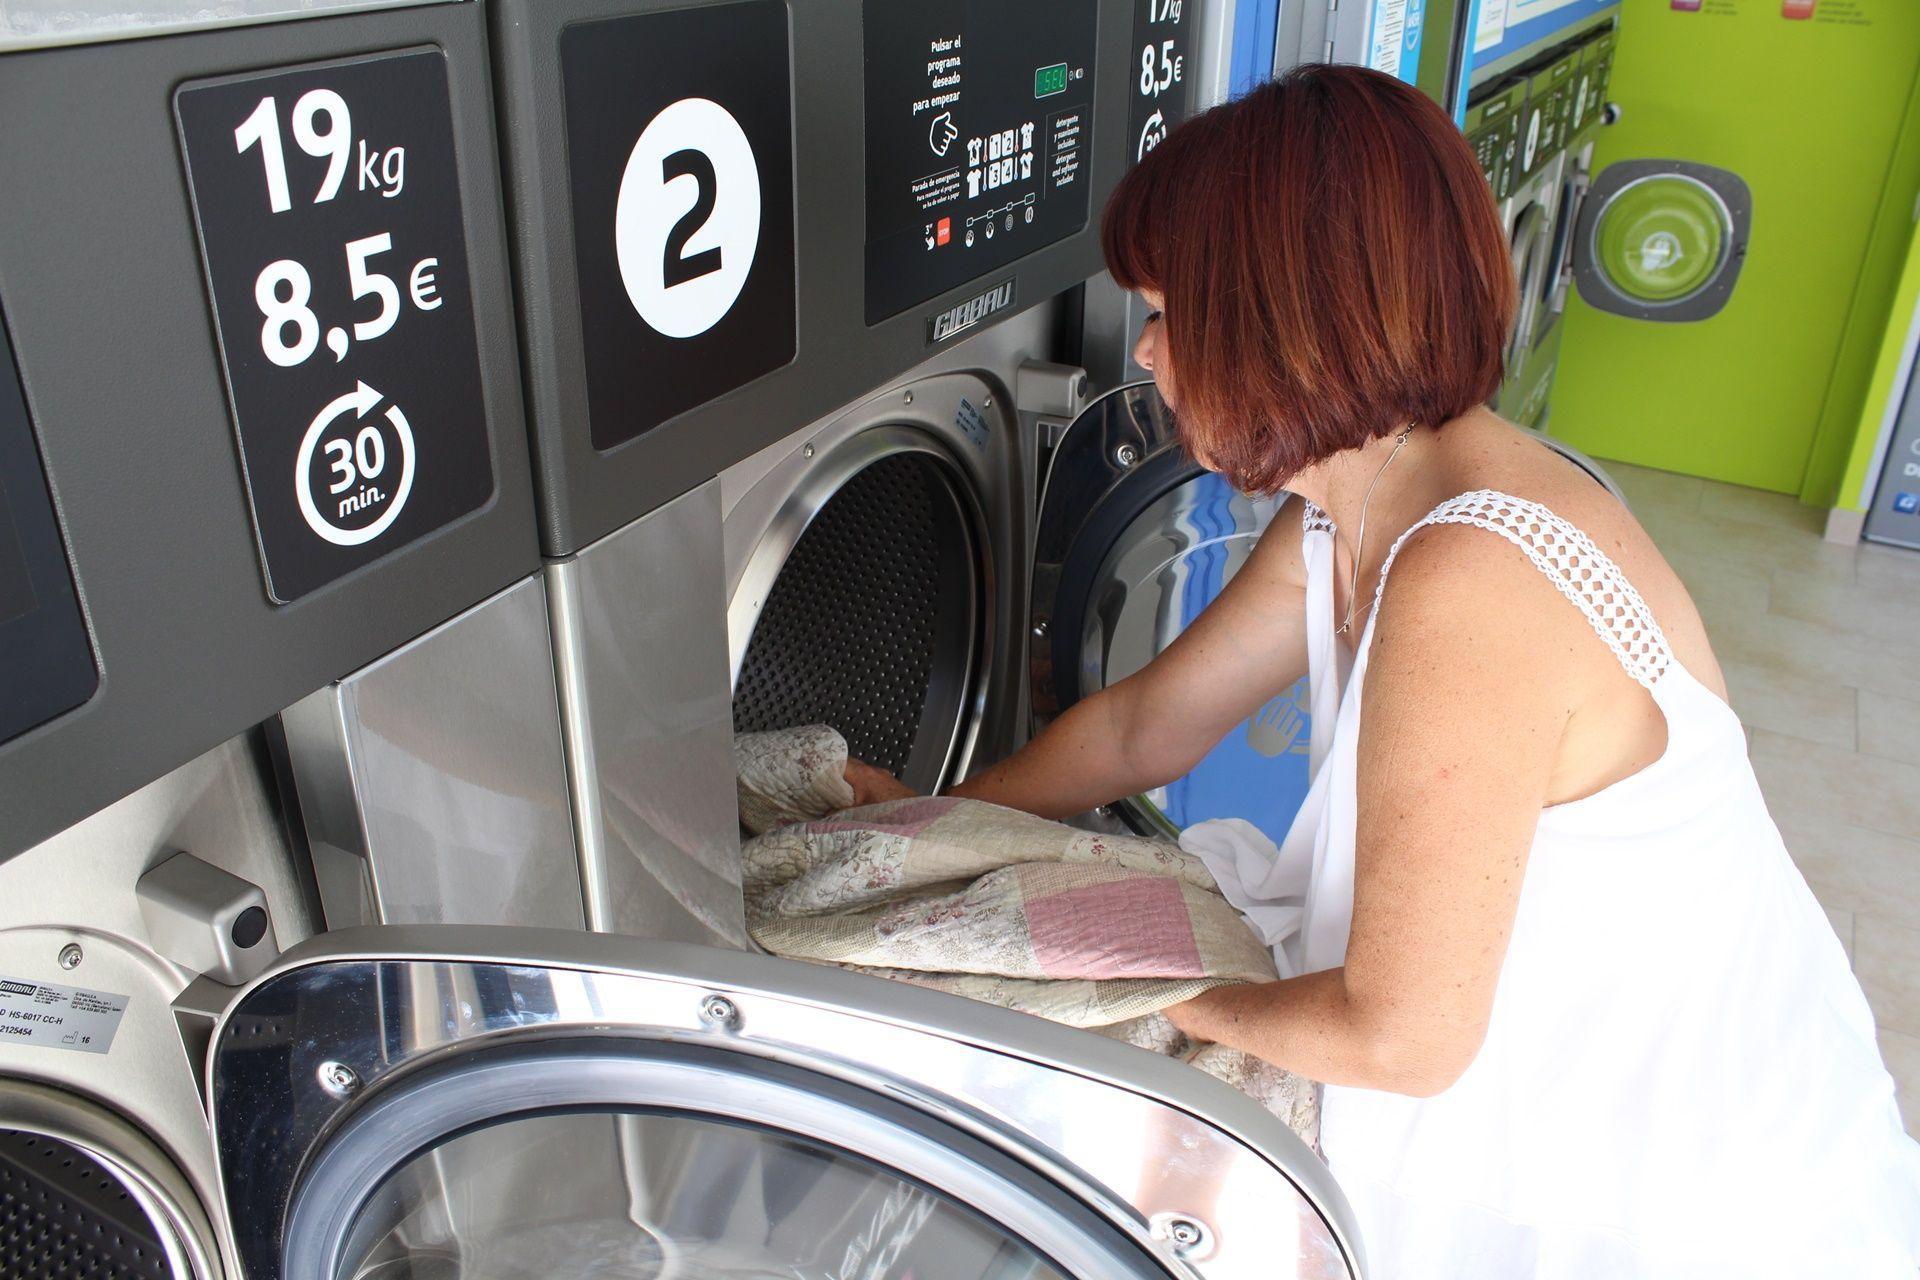 Ecoeficiència i sostenibilitat en les bugaderies autoservei